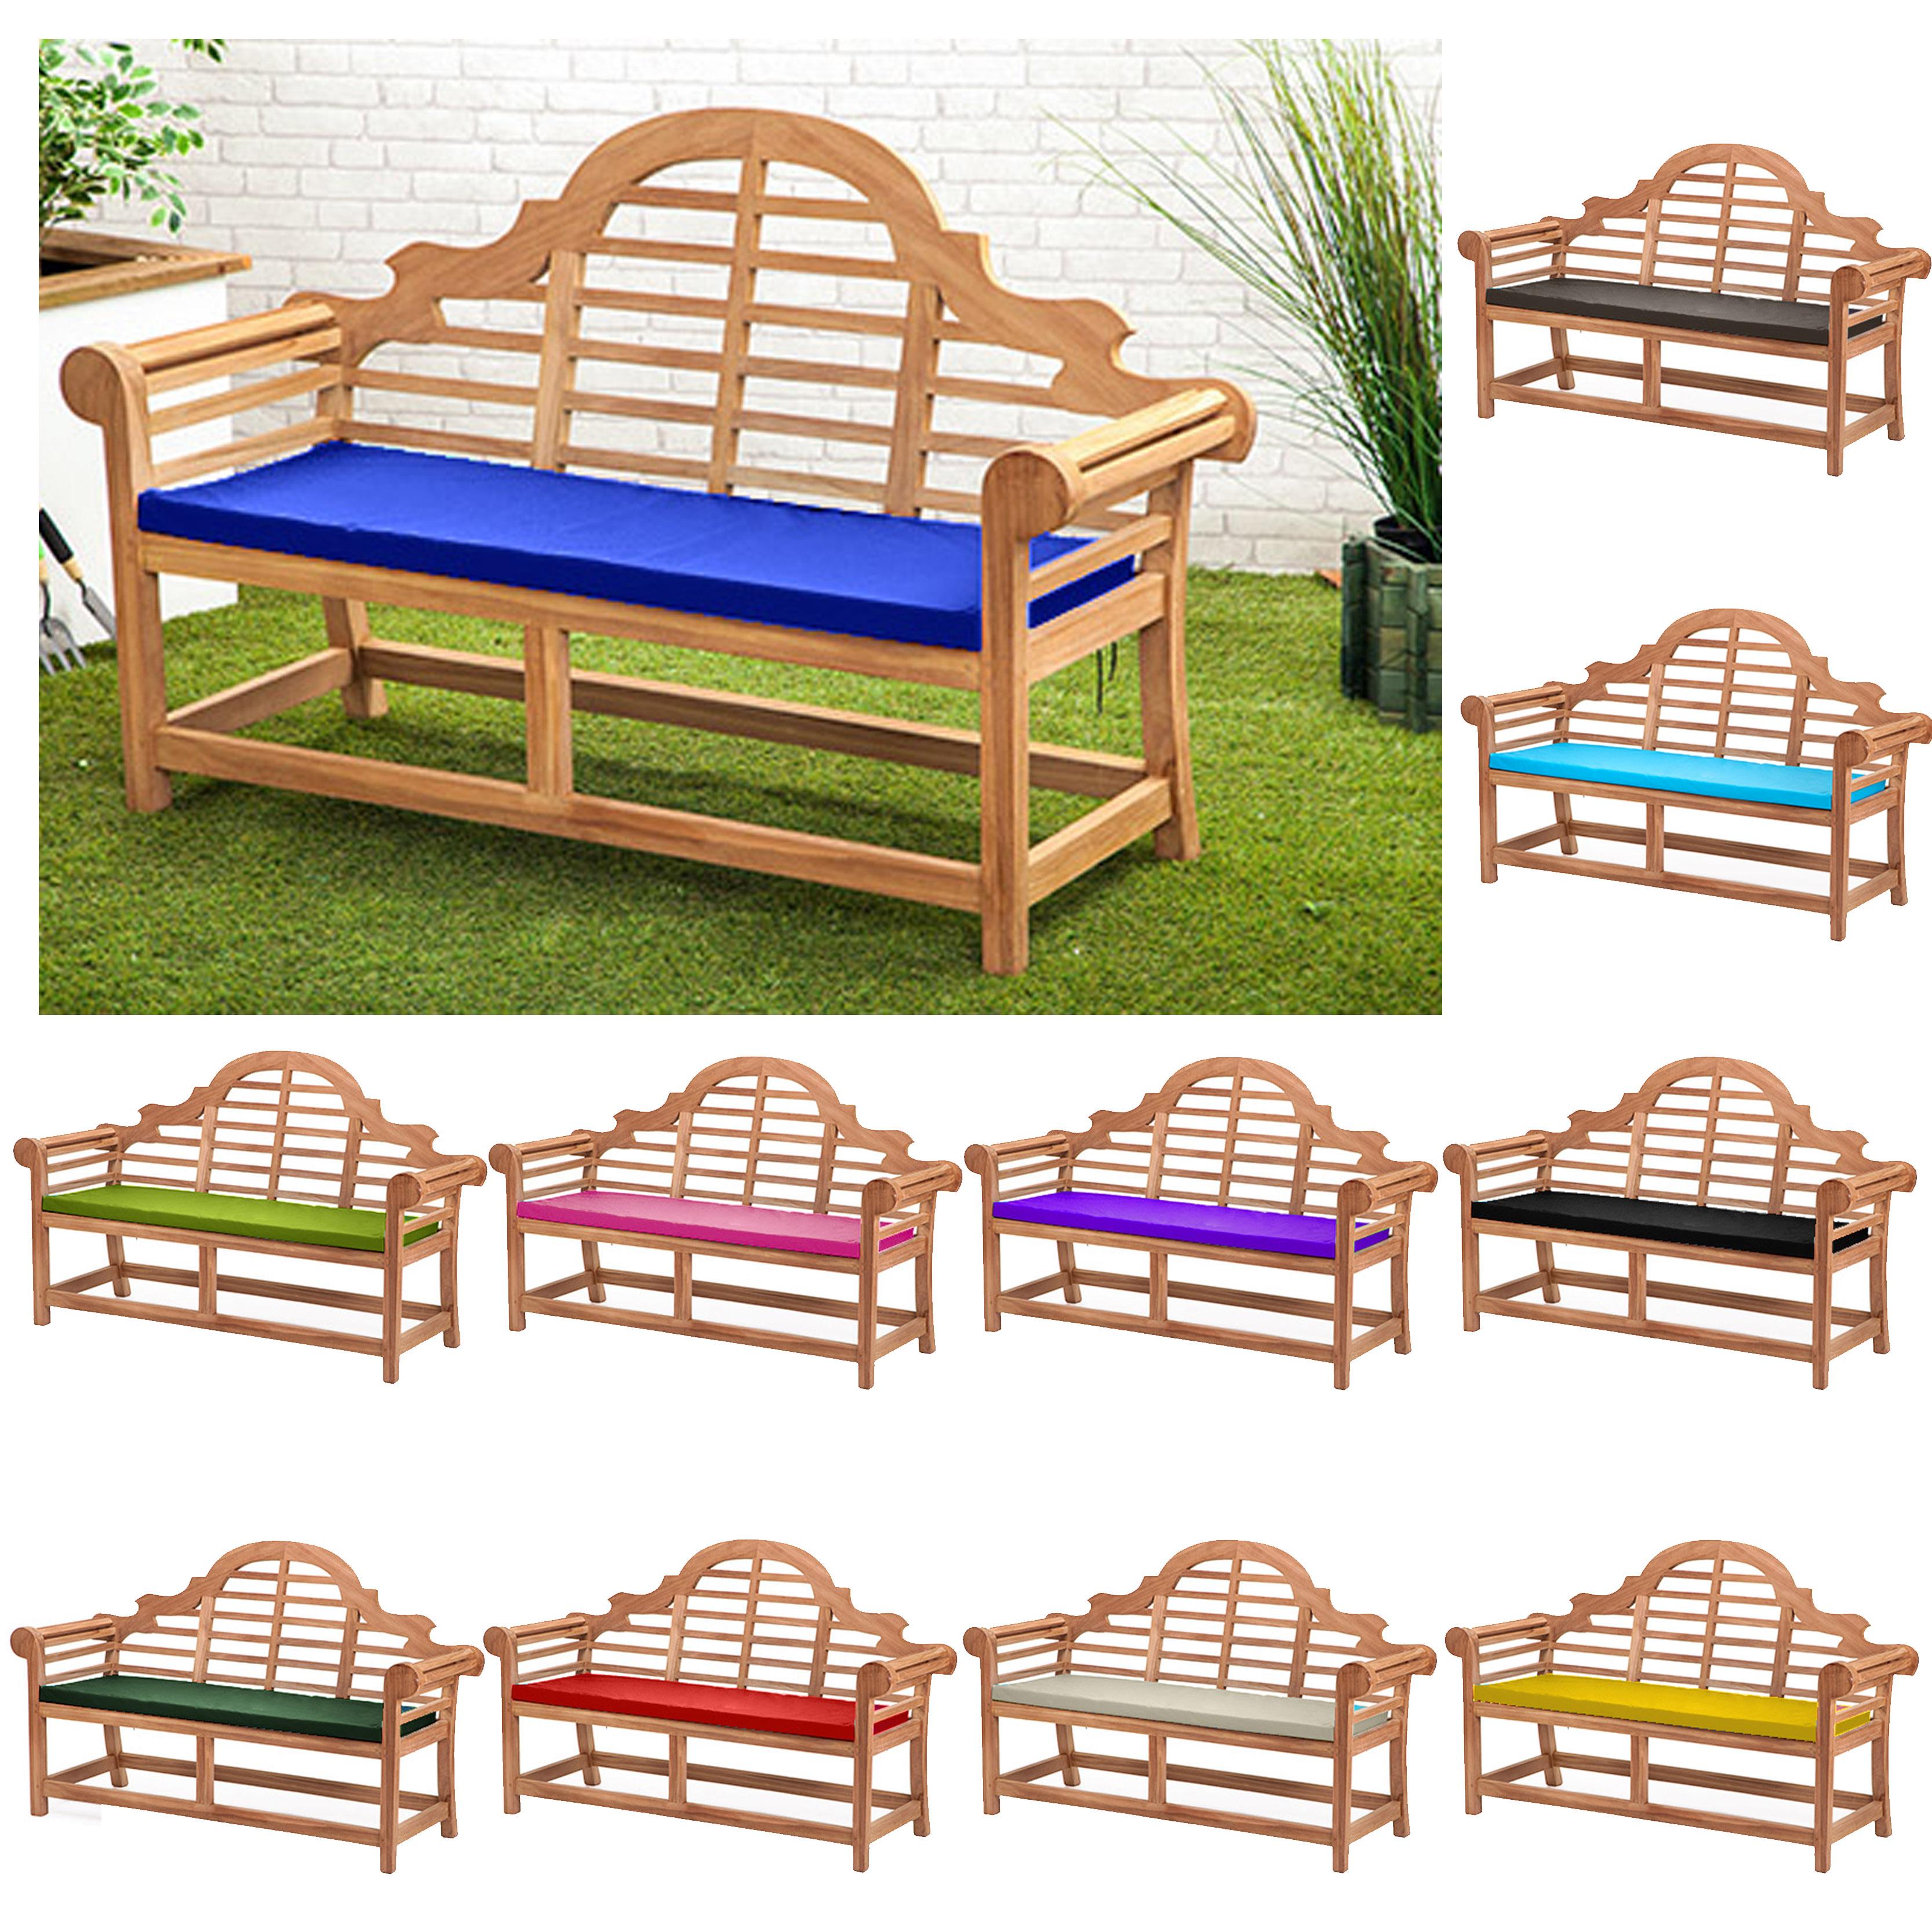 Waterproof Cushion Pads Small Lutyens Teak Bench Garden